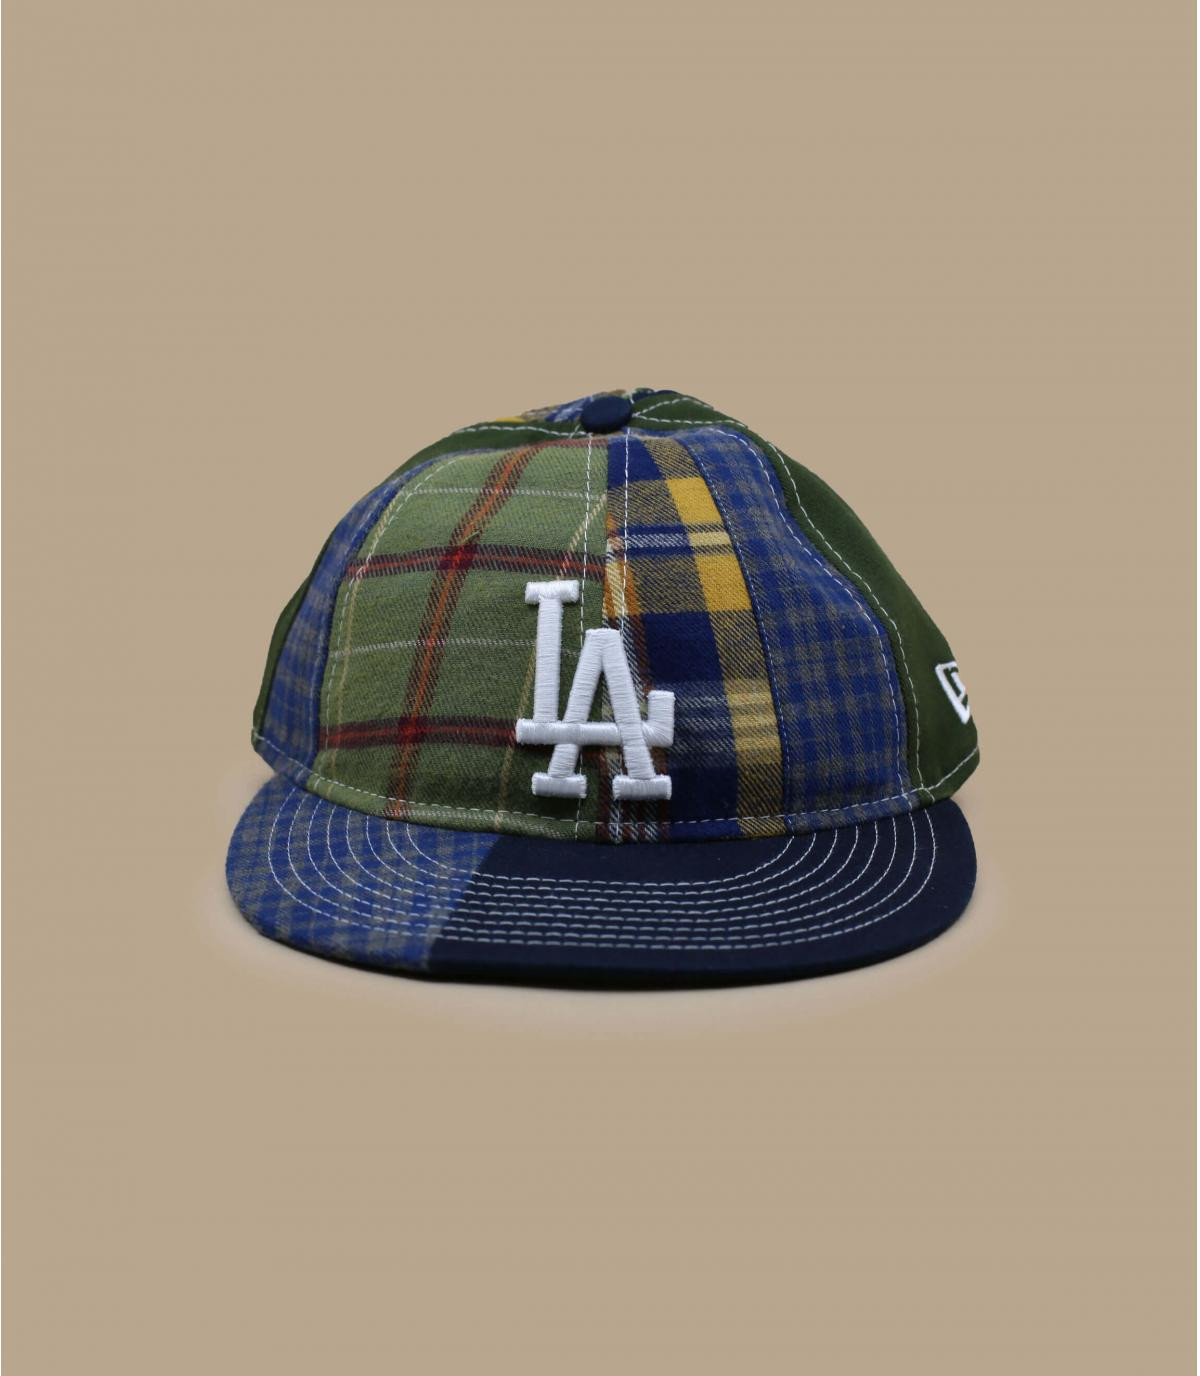 LA cap patchwork